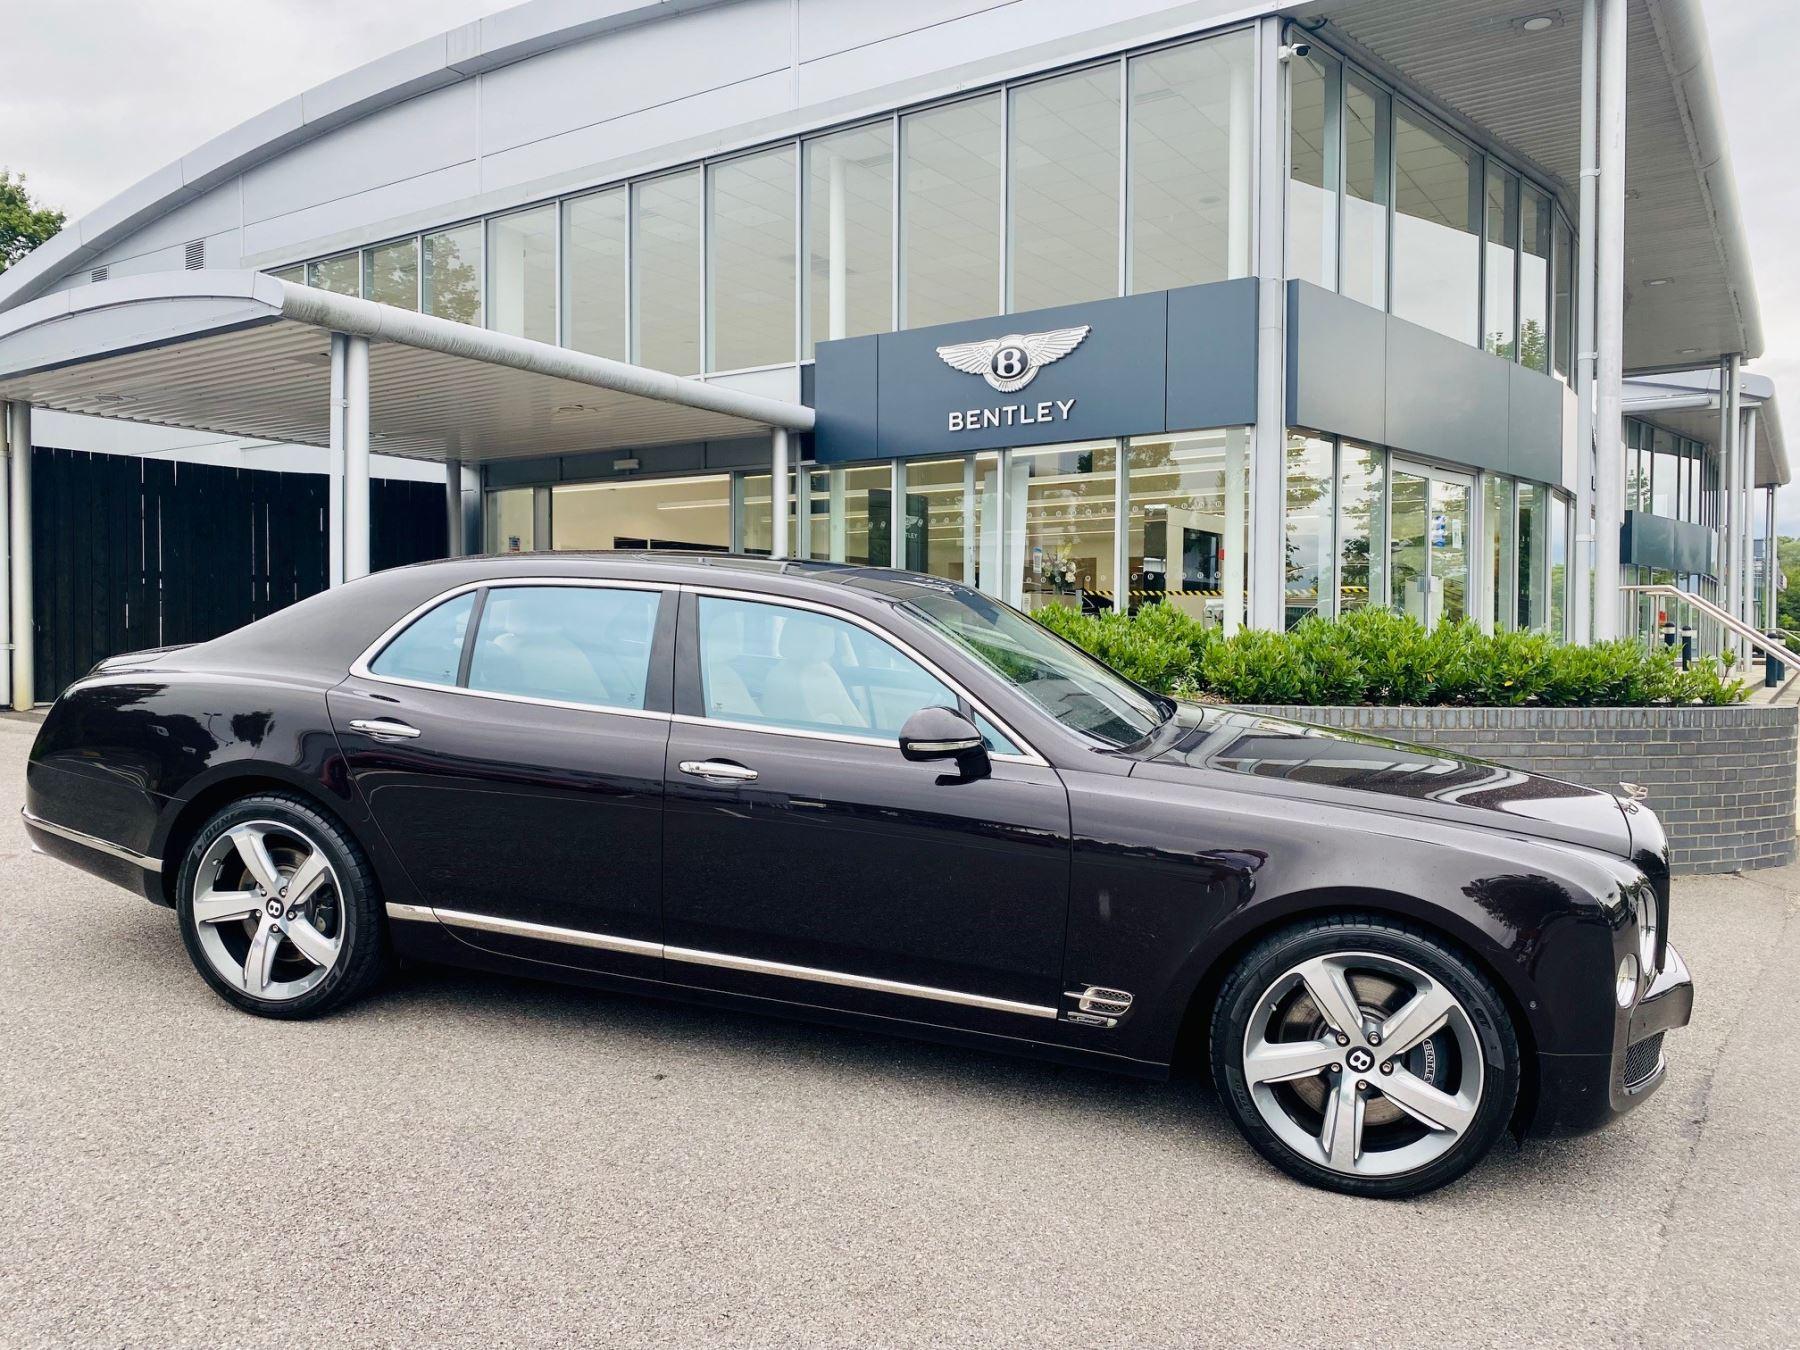 Bentley Mulsanne 6.8 V8 Speed - Speed Premier Specification Automatic 4 door Saloon